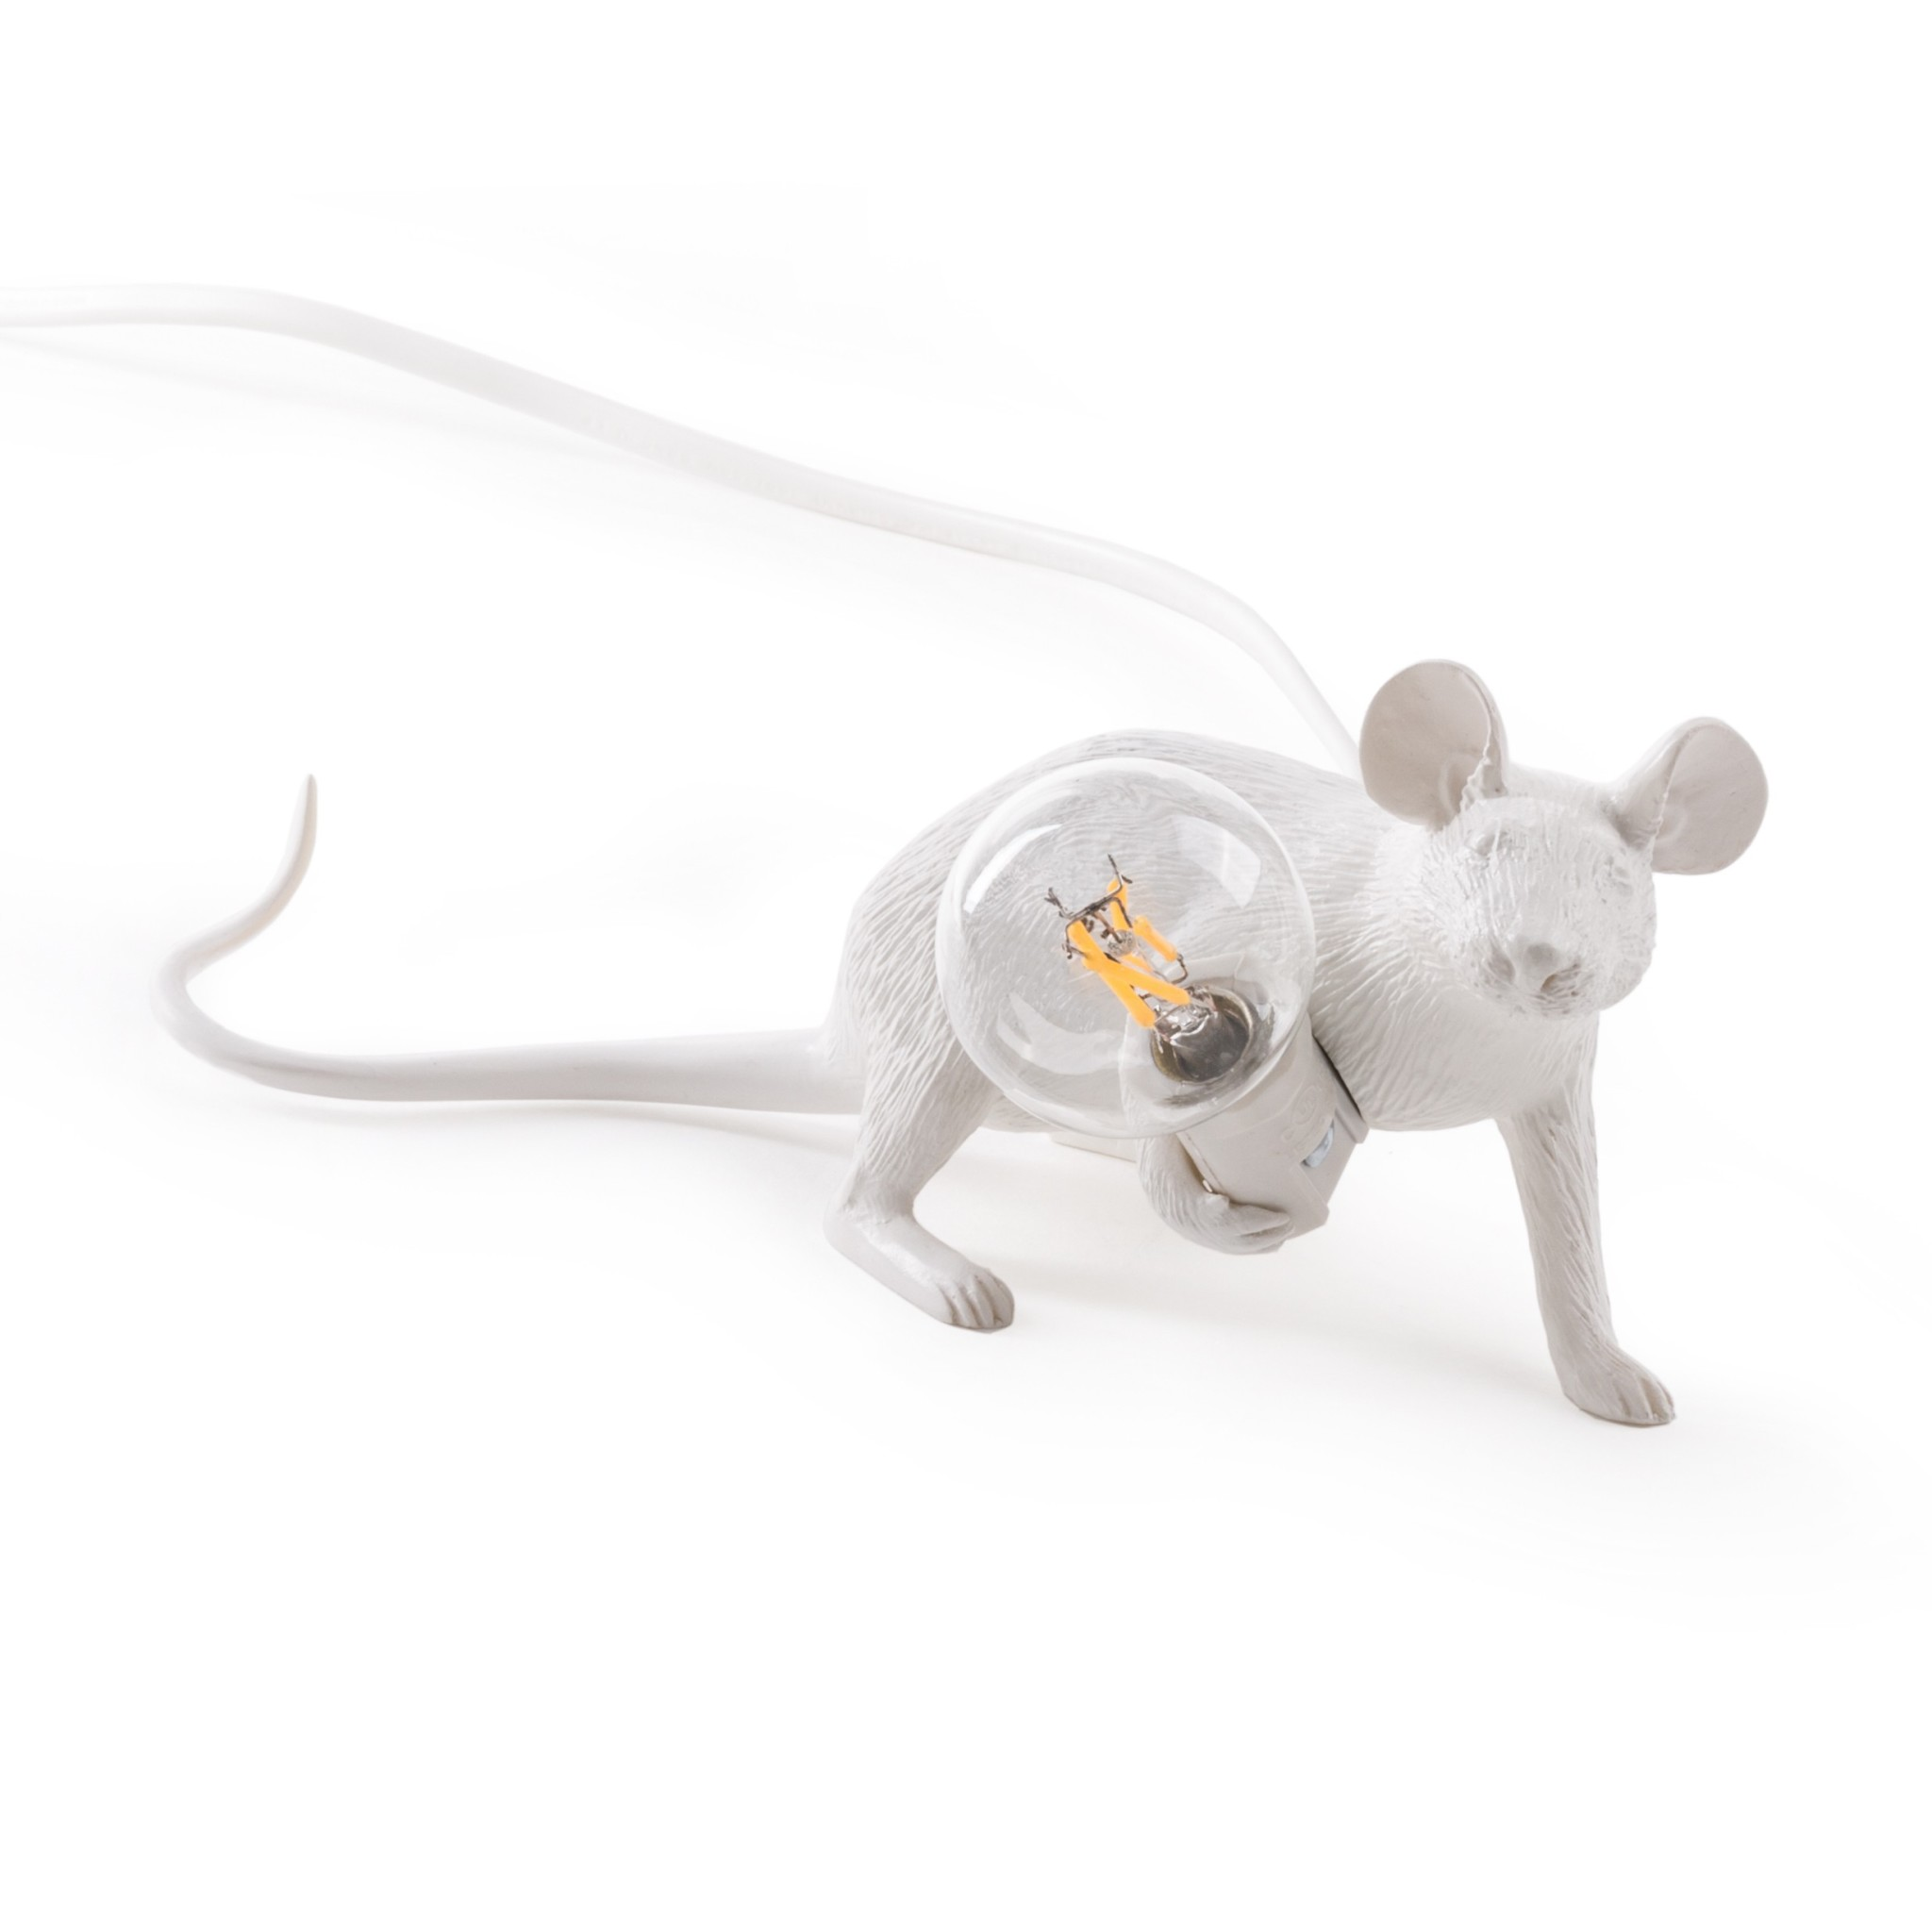 Lampka nocna Mouse, Seletti, Pufa Design Showroom z Kołobrzegu - www.pufadesign.pl